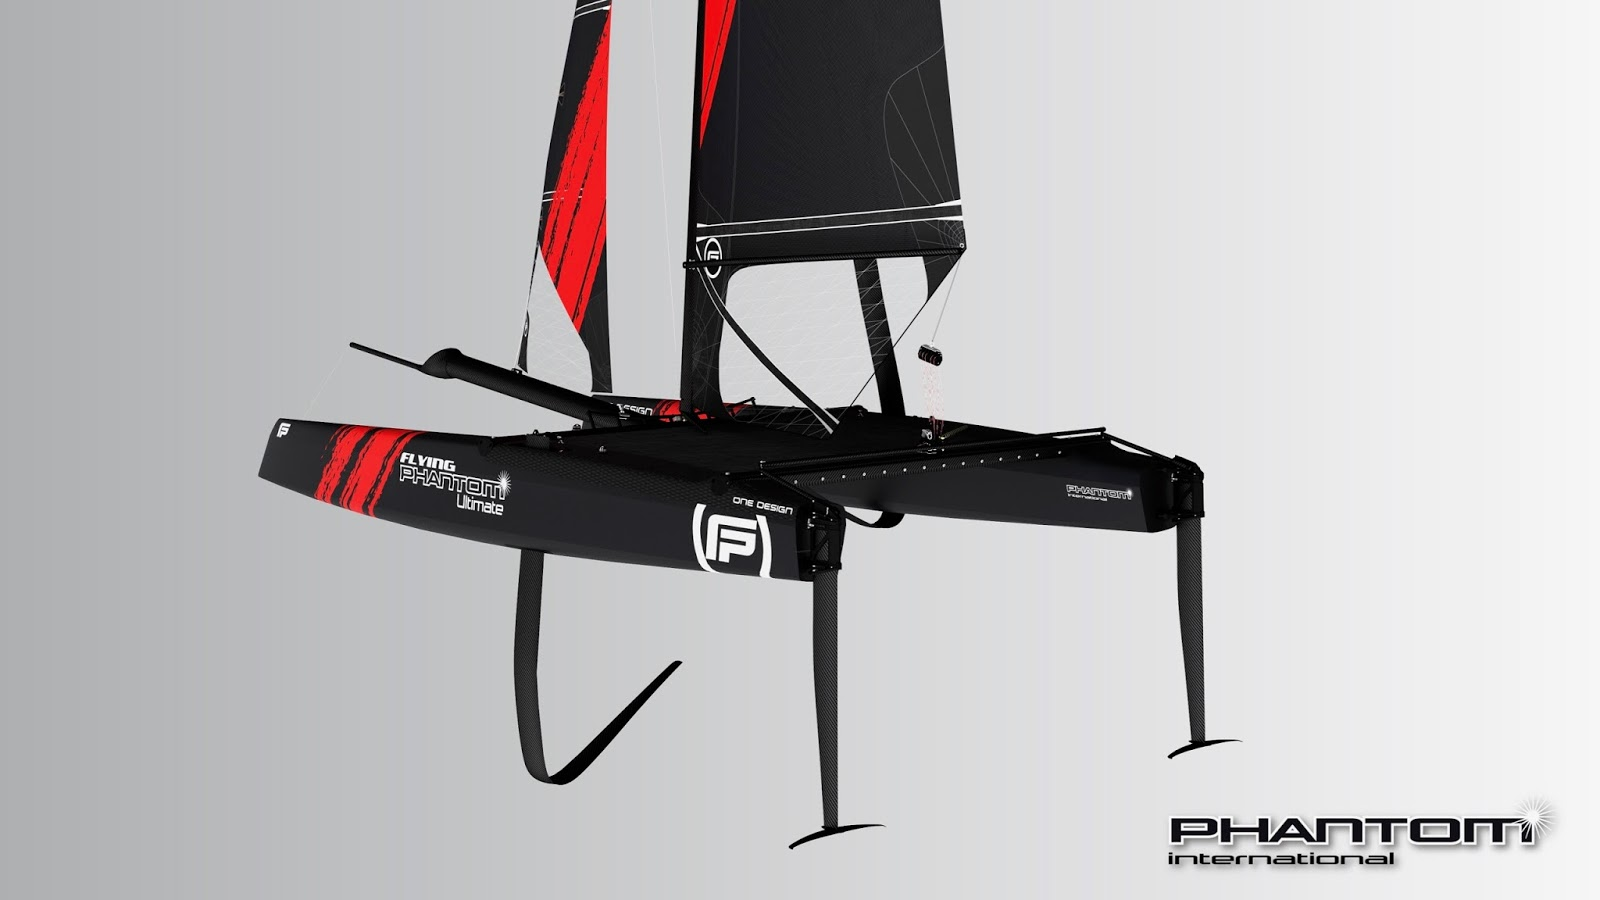 New Flying Phantom version for 2018 : The 'Ultimate' – Catamaran